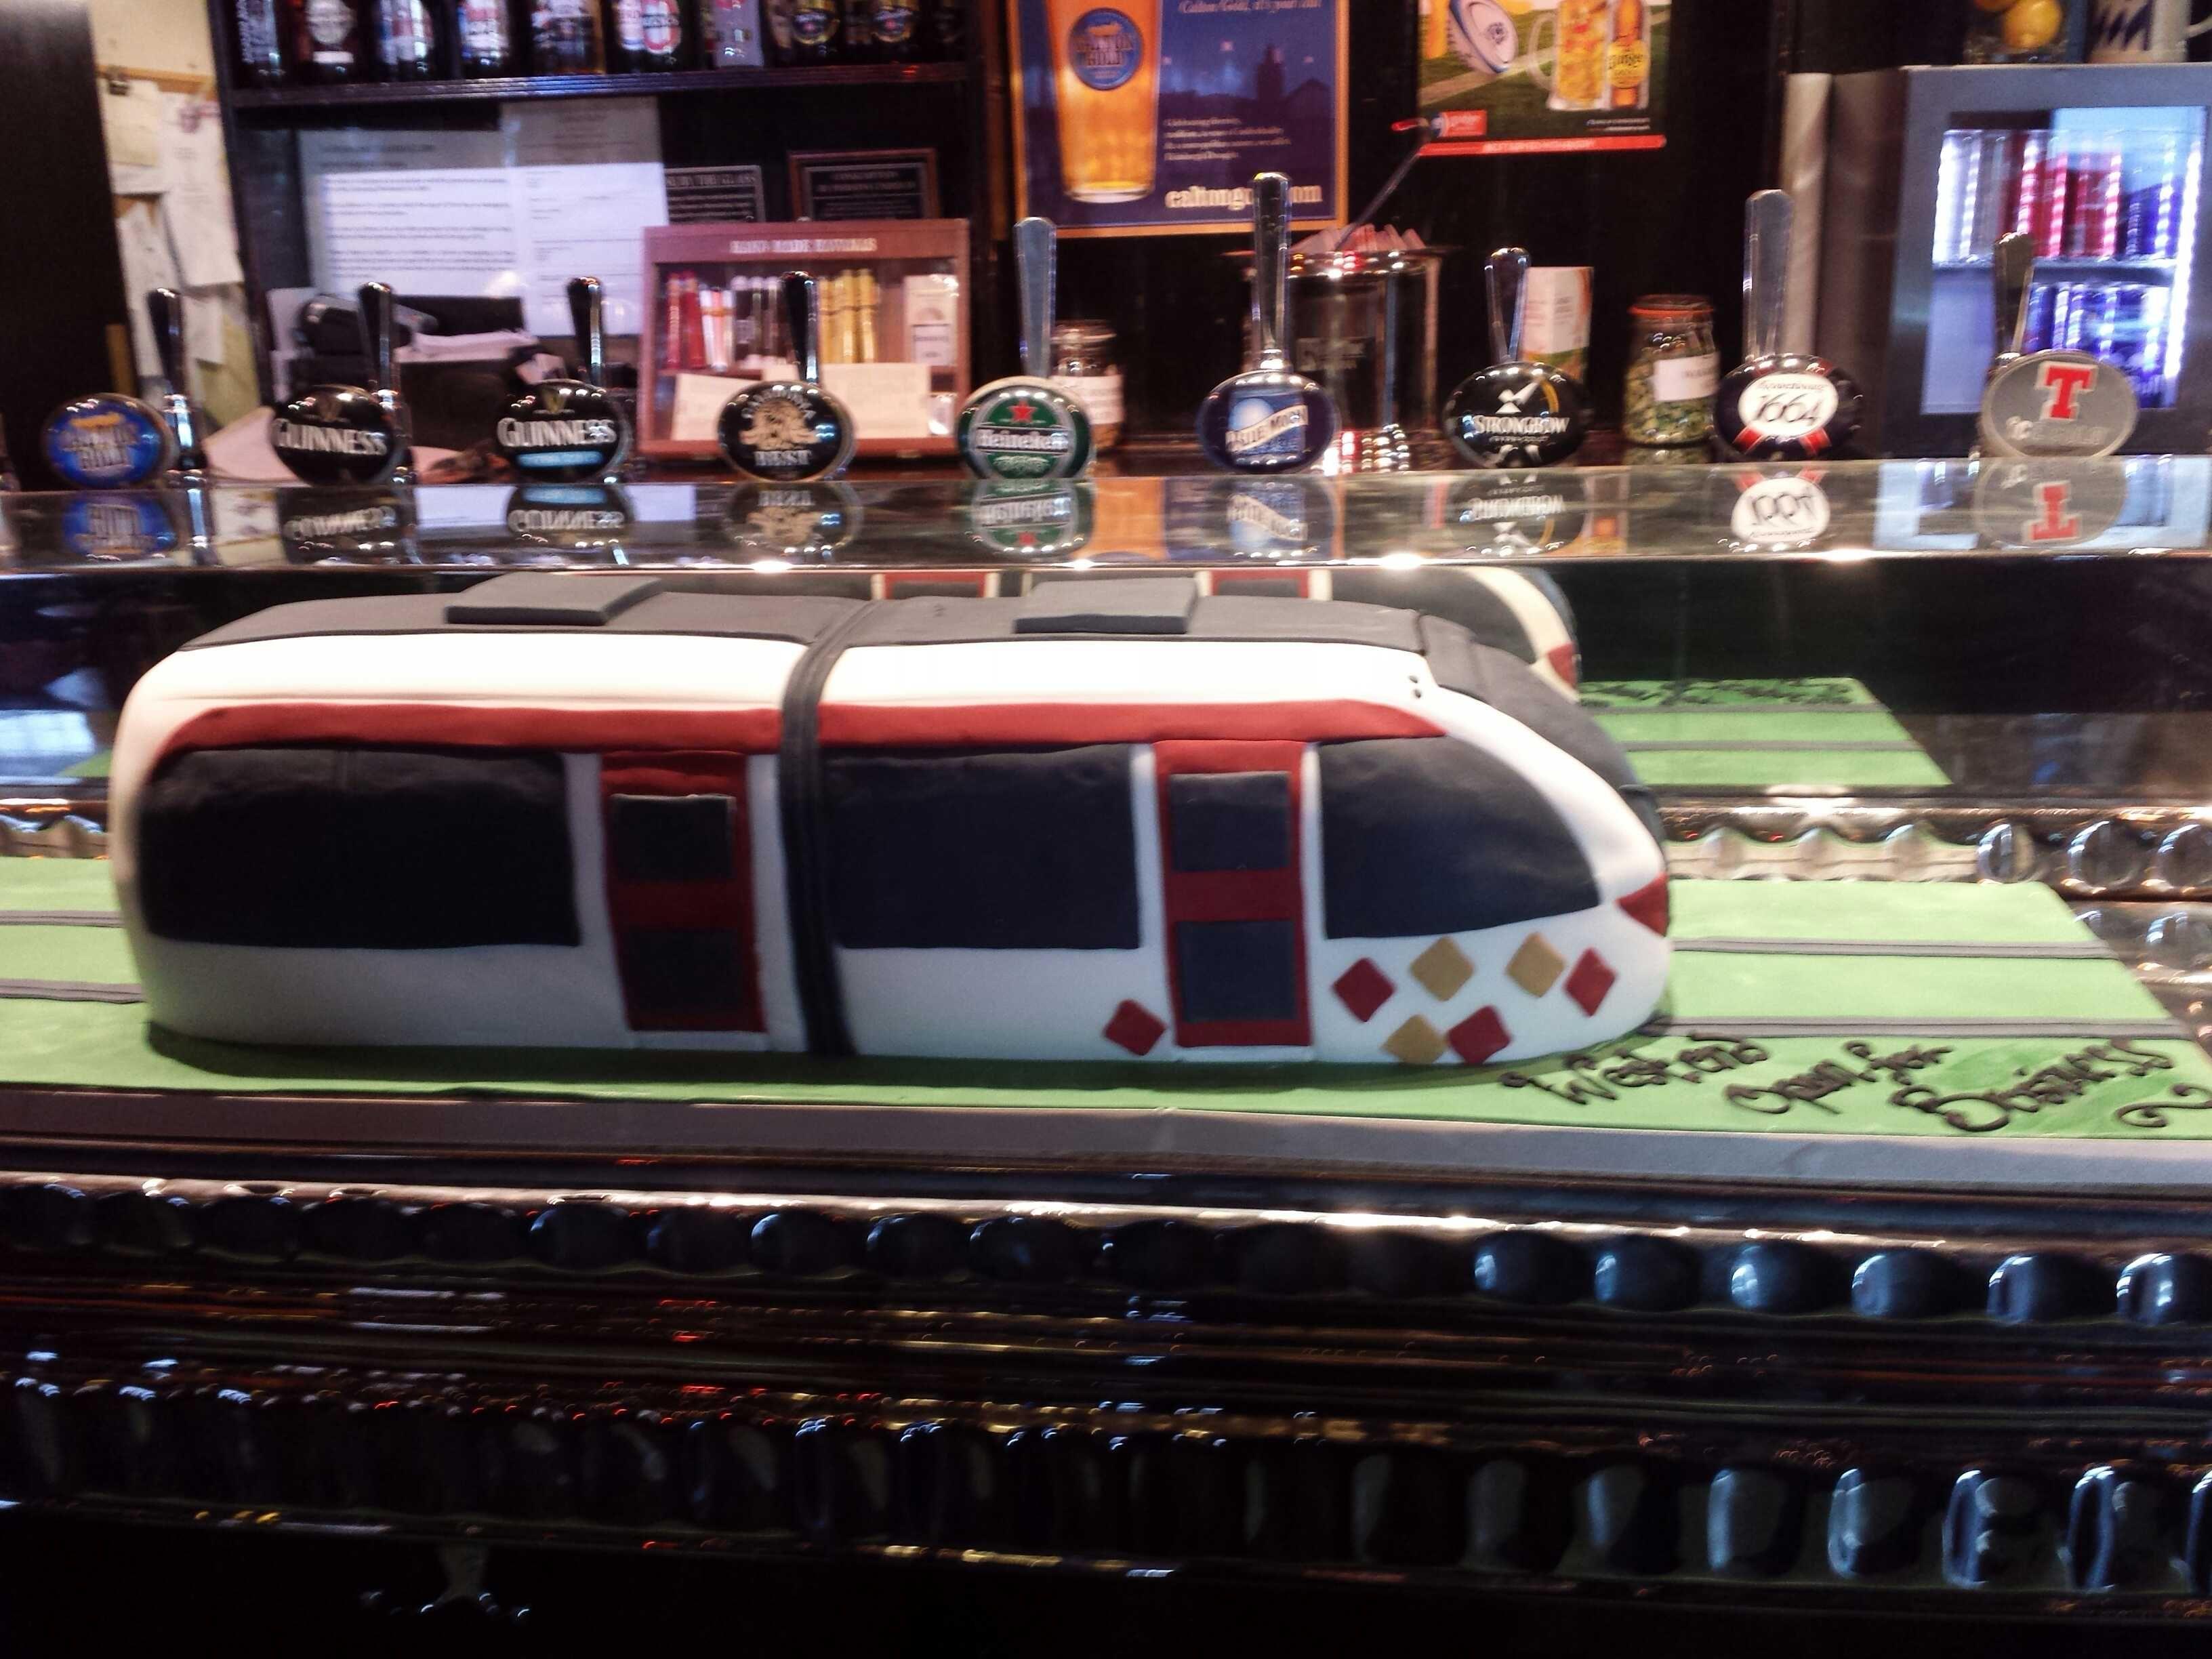 edinburgh tram cake made by liggy s cake company to celebrate the on specialist birthday cakes edinburgh